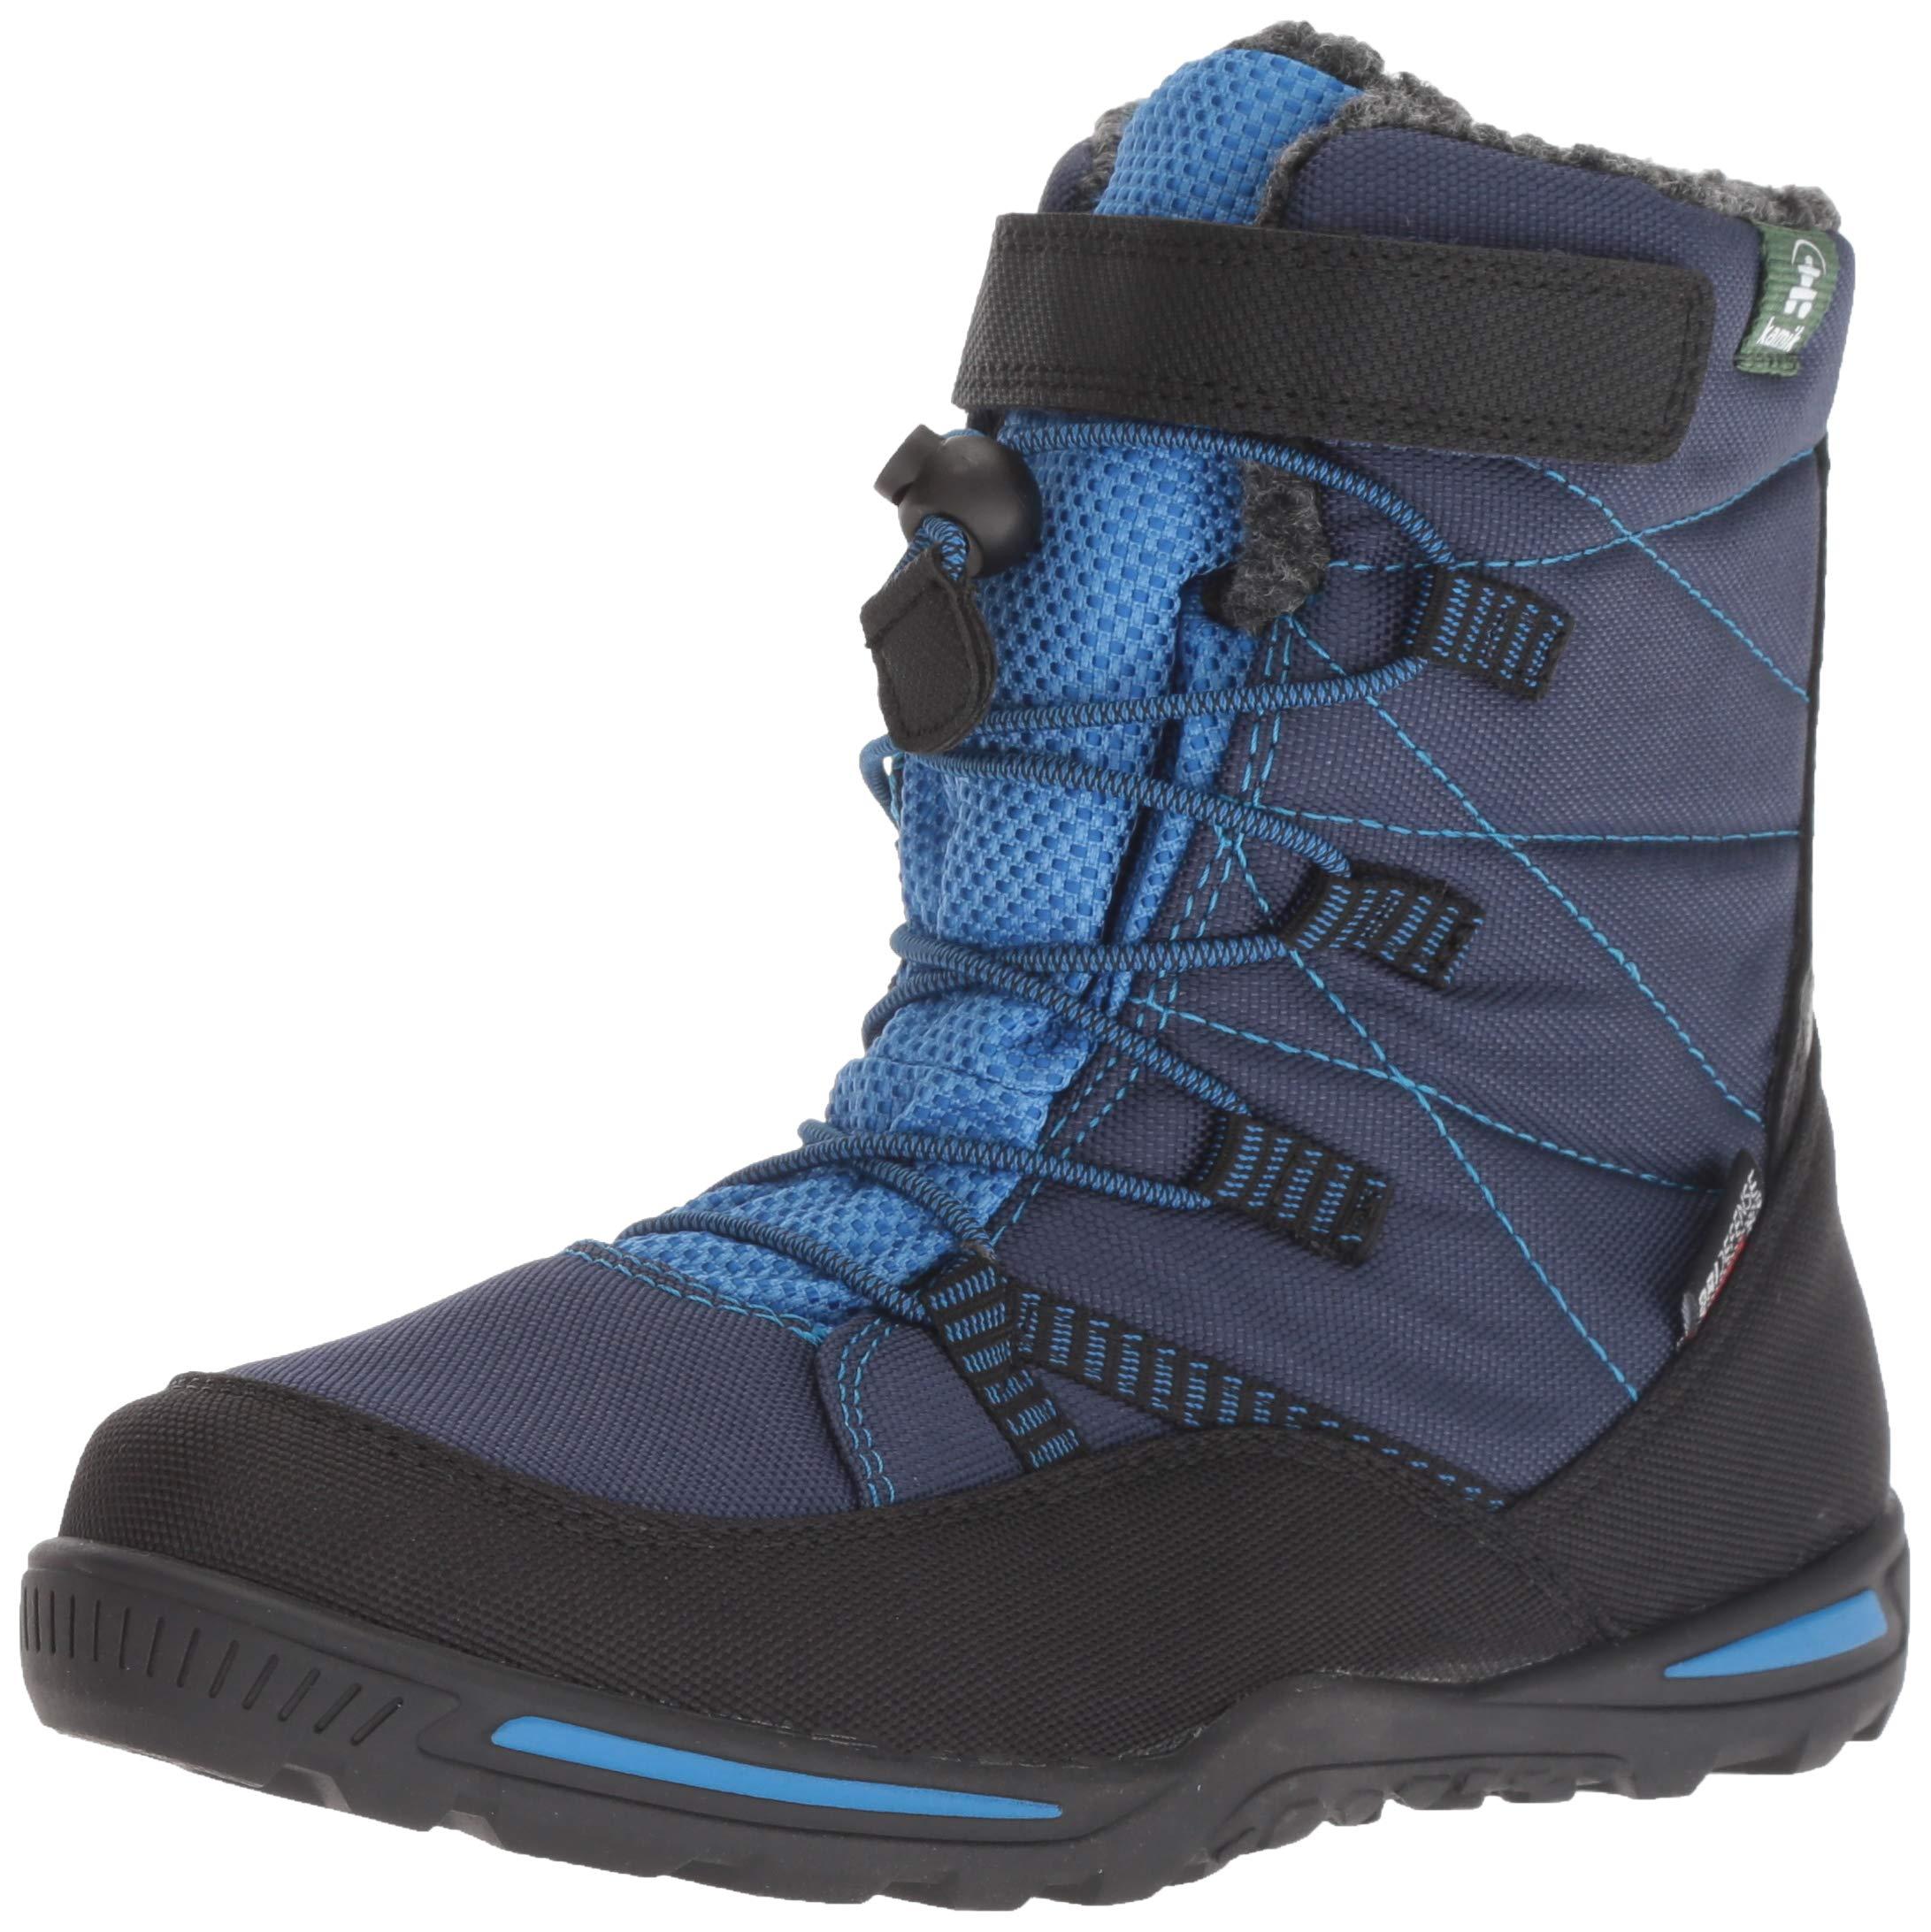 Kamik Boys' JACE Snow Boot, Navy/Blue, 6 Medium US Big Kid